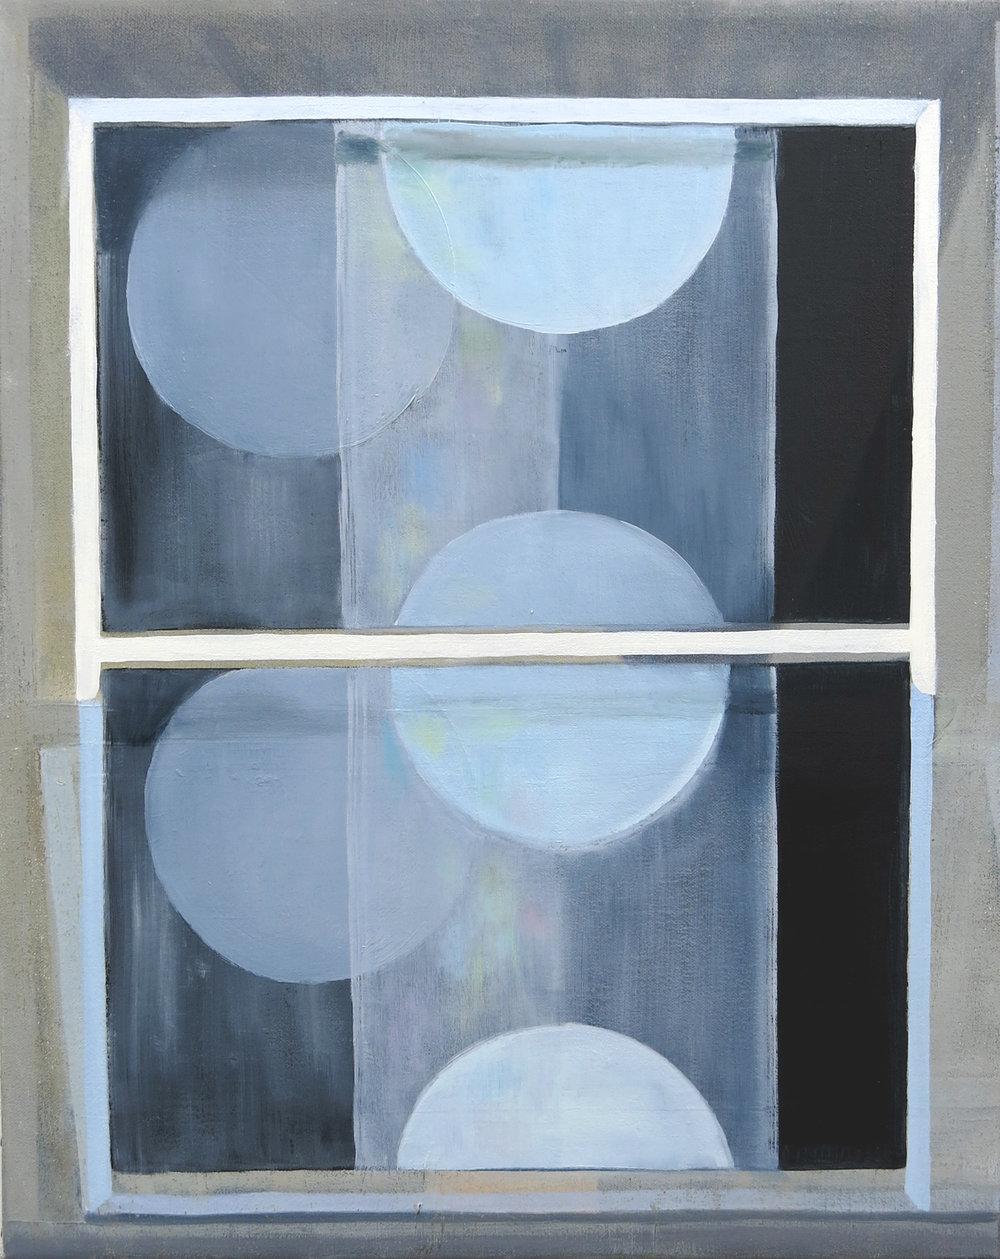 Double Blind    2016, oil on canvas, 30 x 40cm